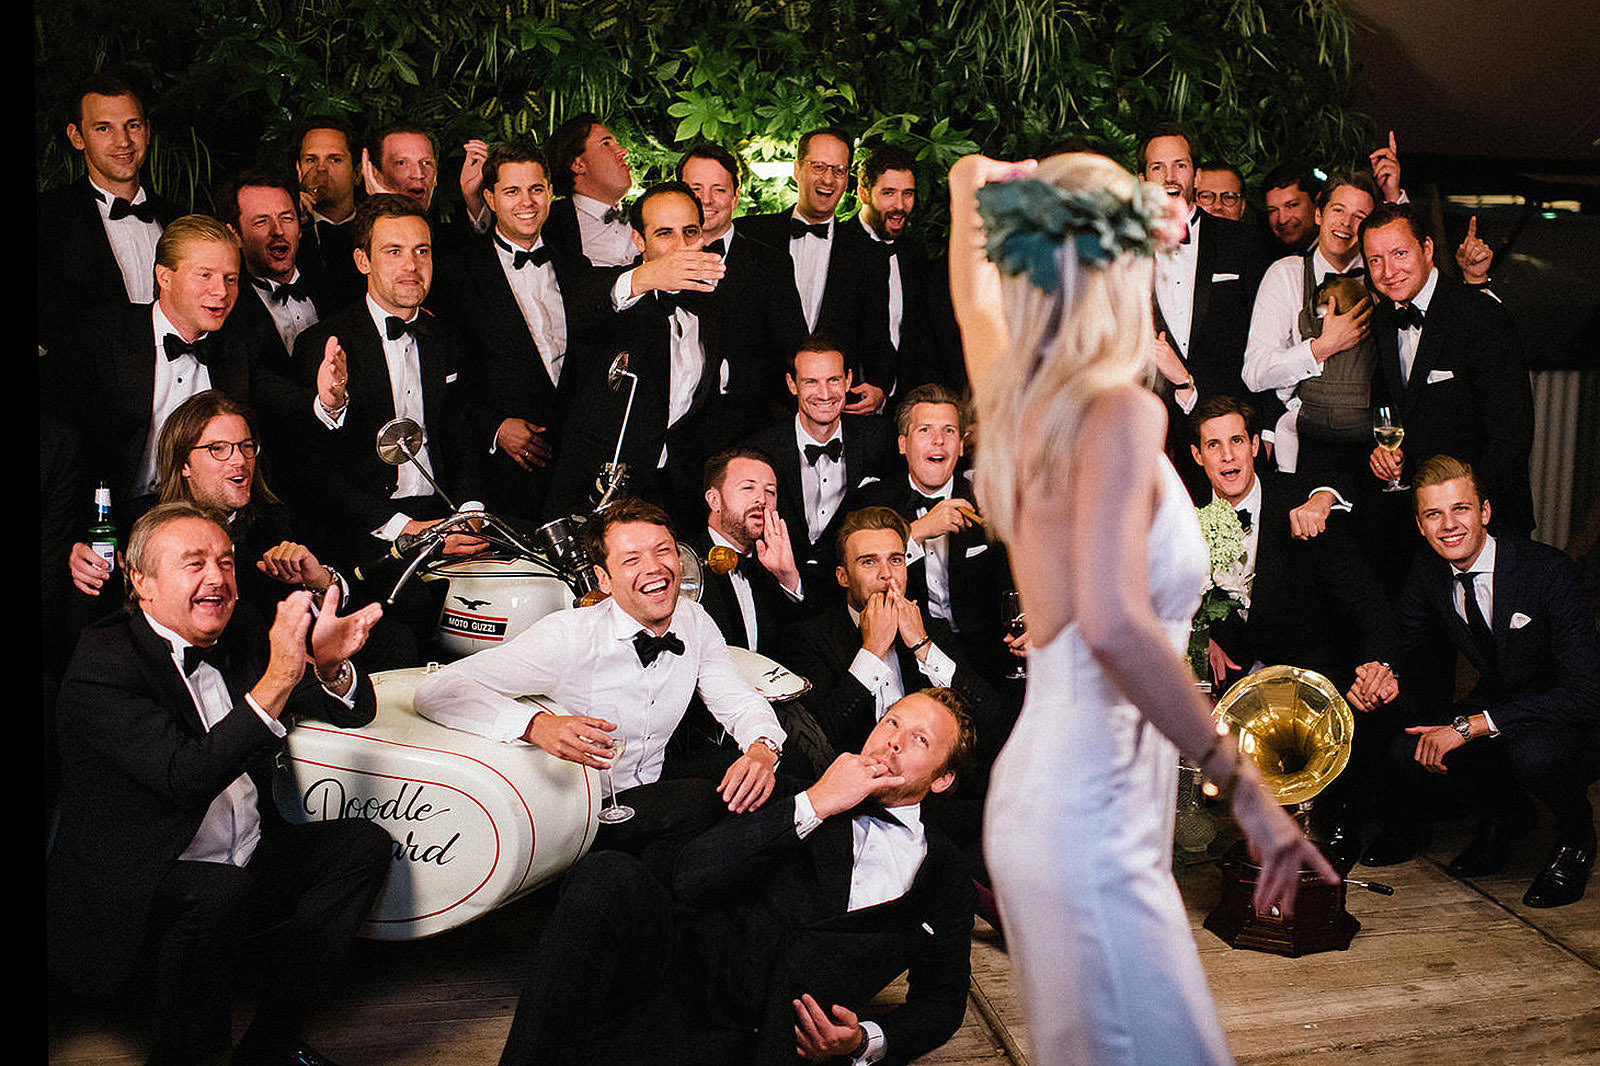 Fotograf Konstanz - Destination Wedding Photographer Amsterdam 119A - Destination Wedding Amsterdam  - 225 -